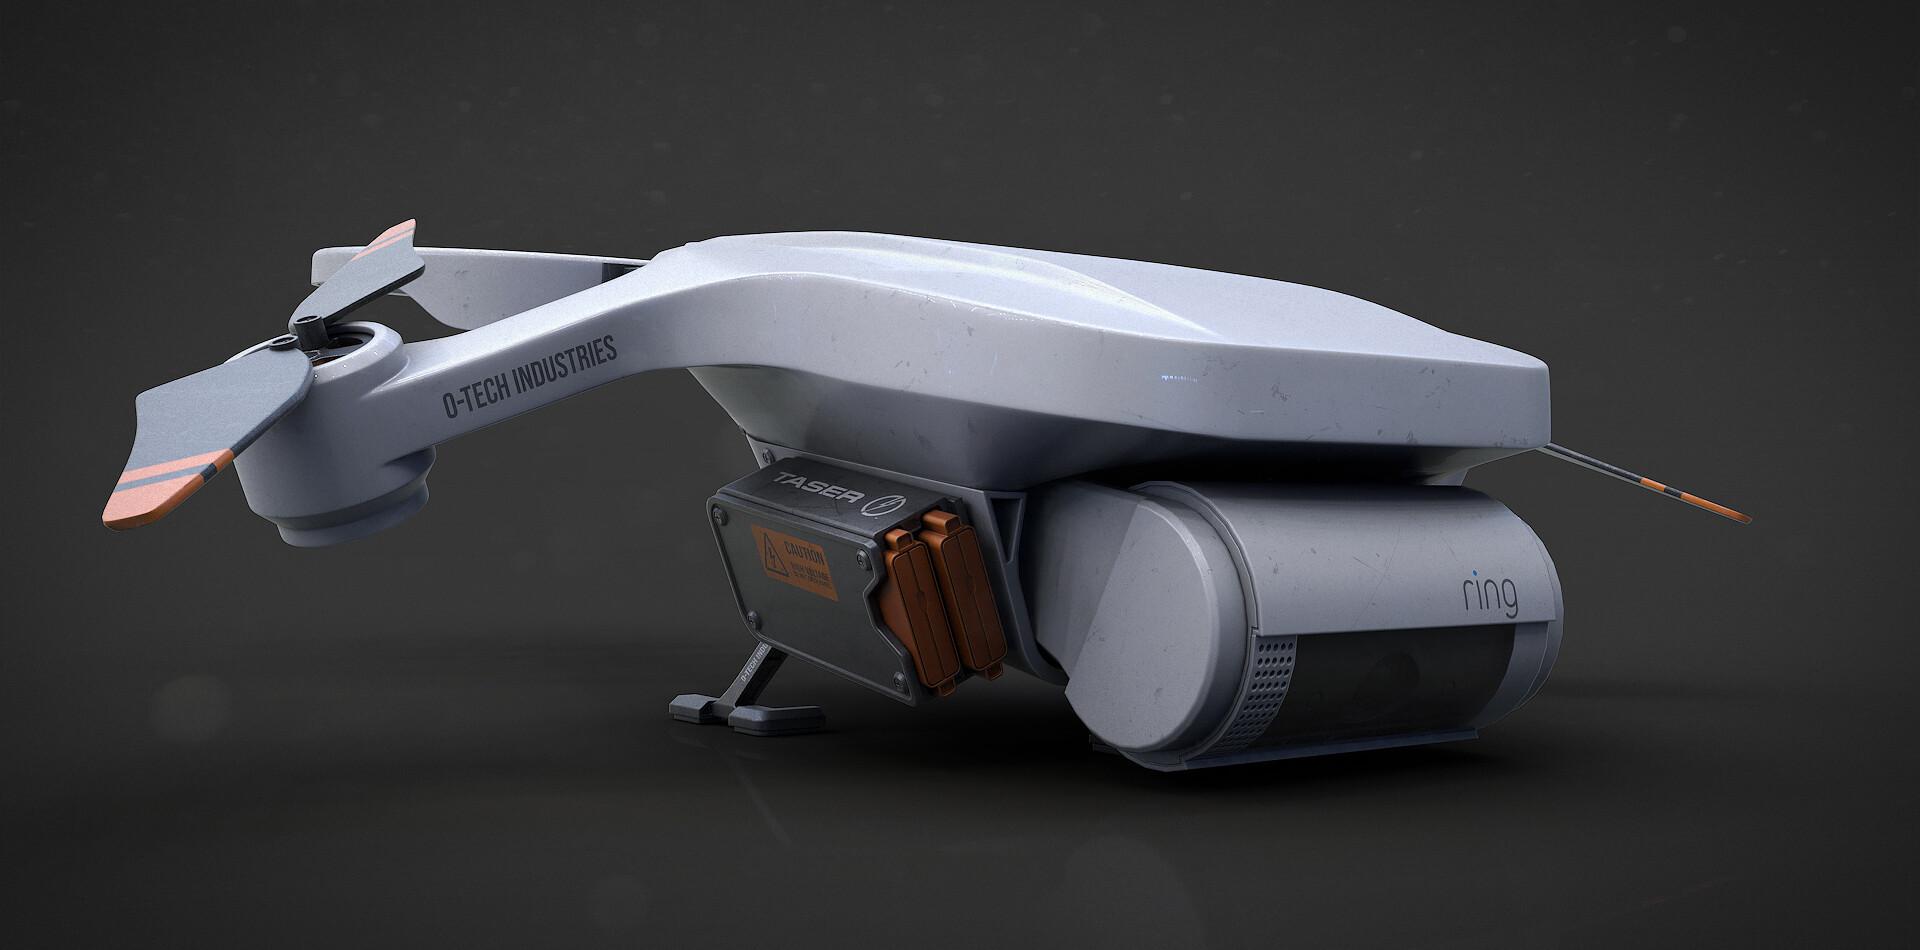 Mathew o drone 2